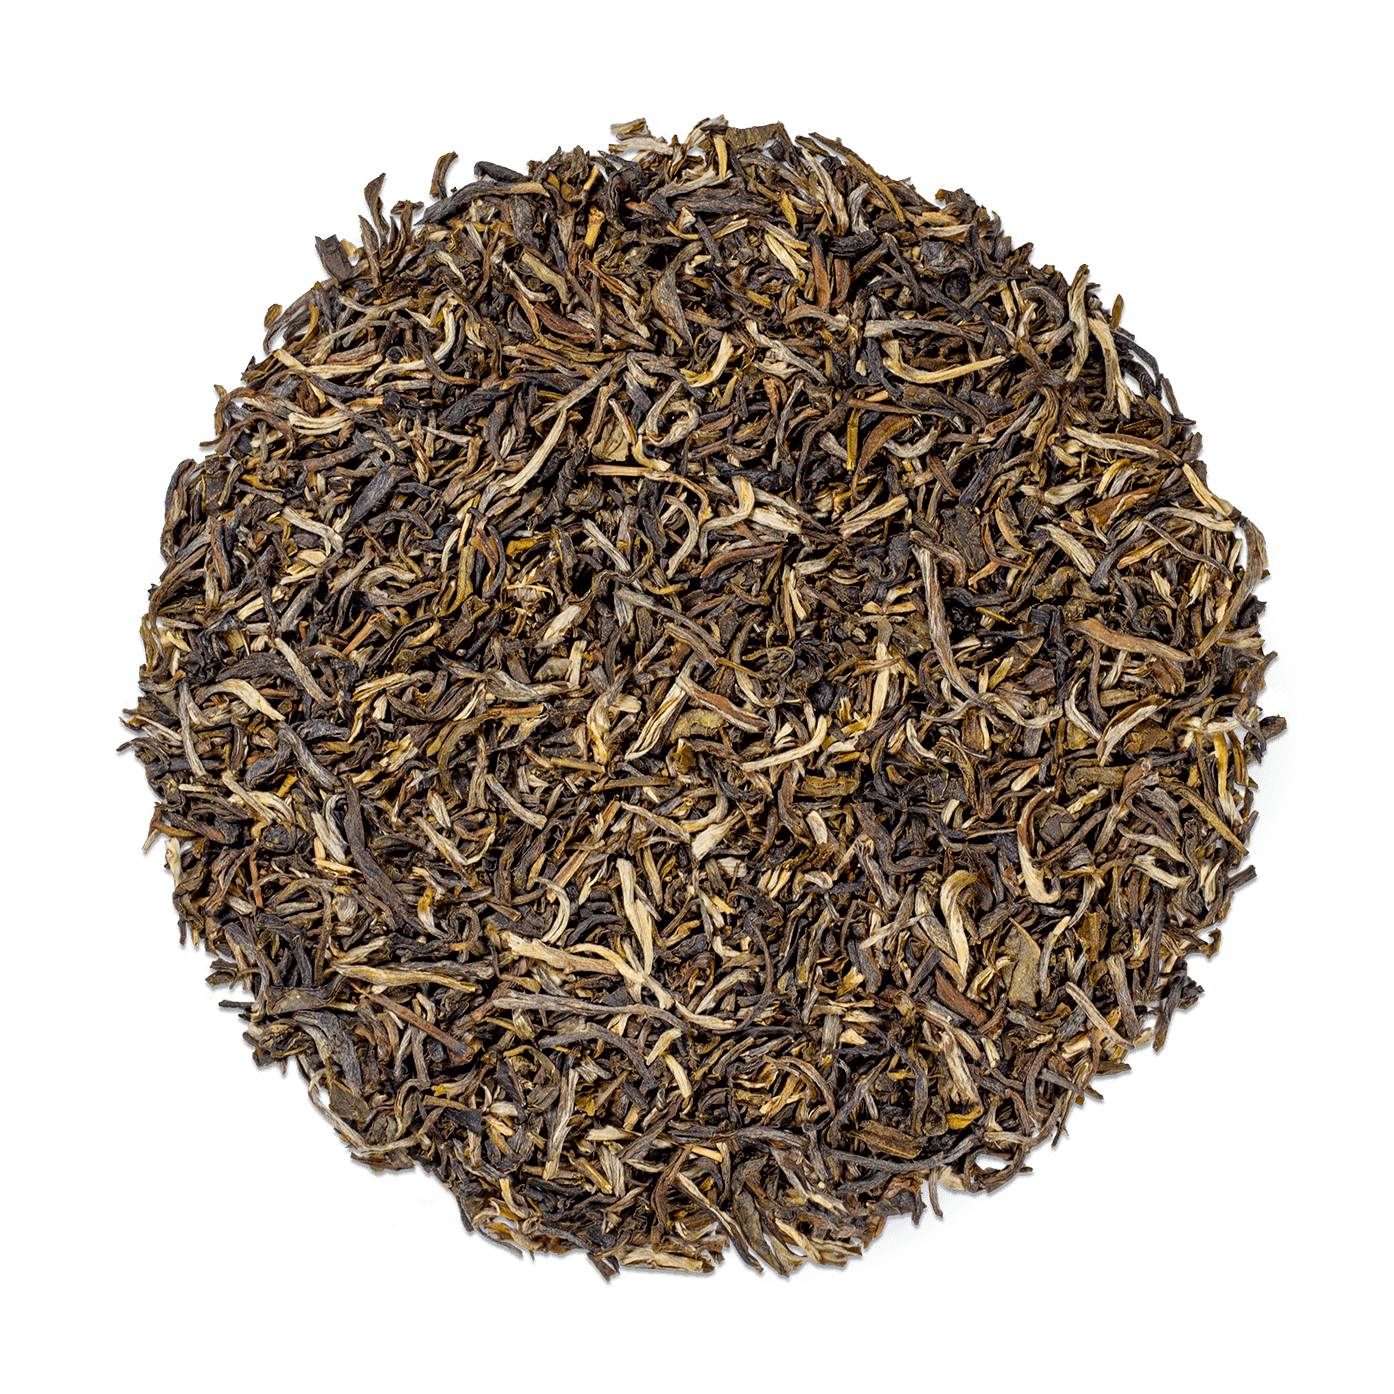 KUSMI TEA White Bellini bio - Thé blanc aromatisé pêche-abricot - Thé en vrac - Kusmi Tea